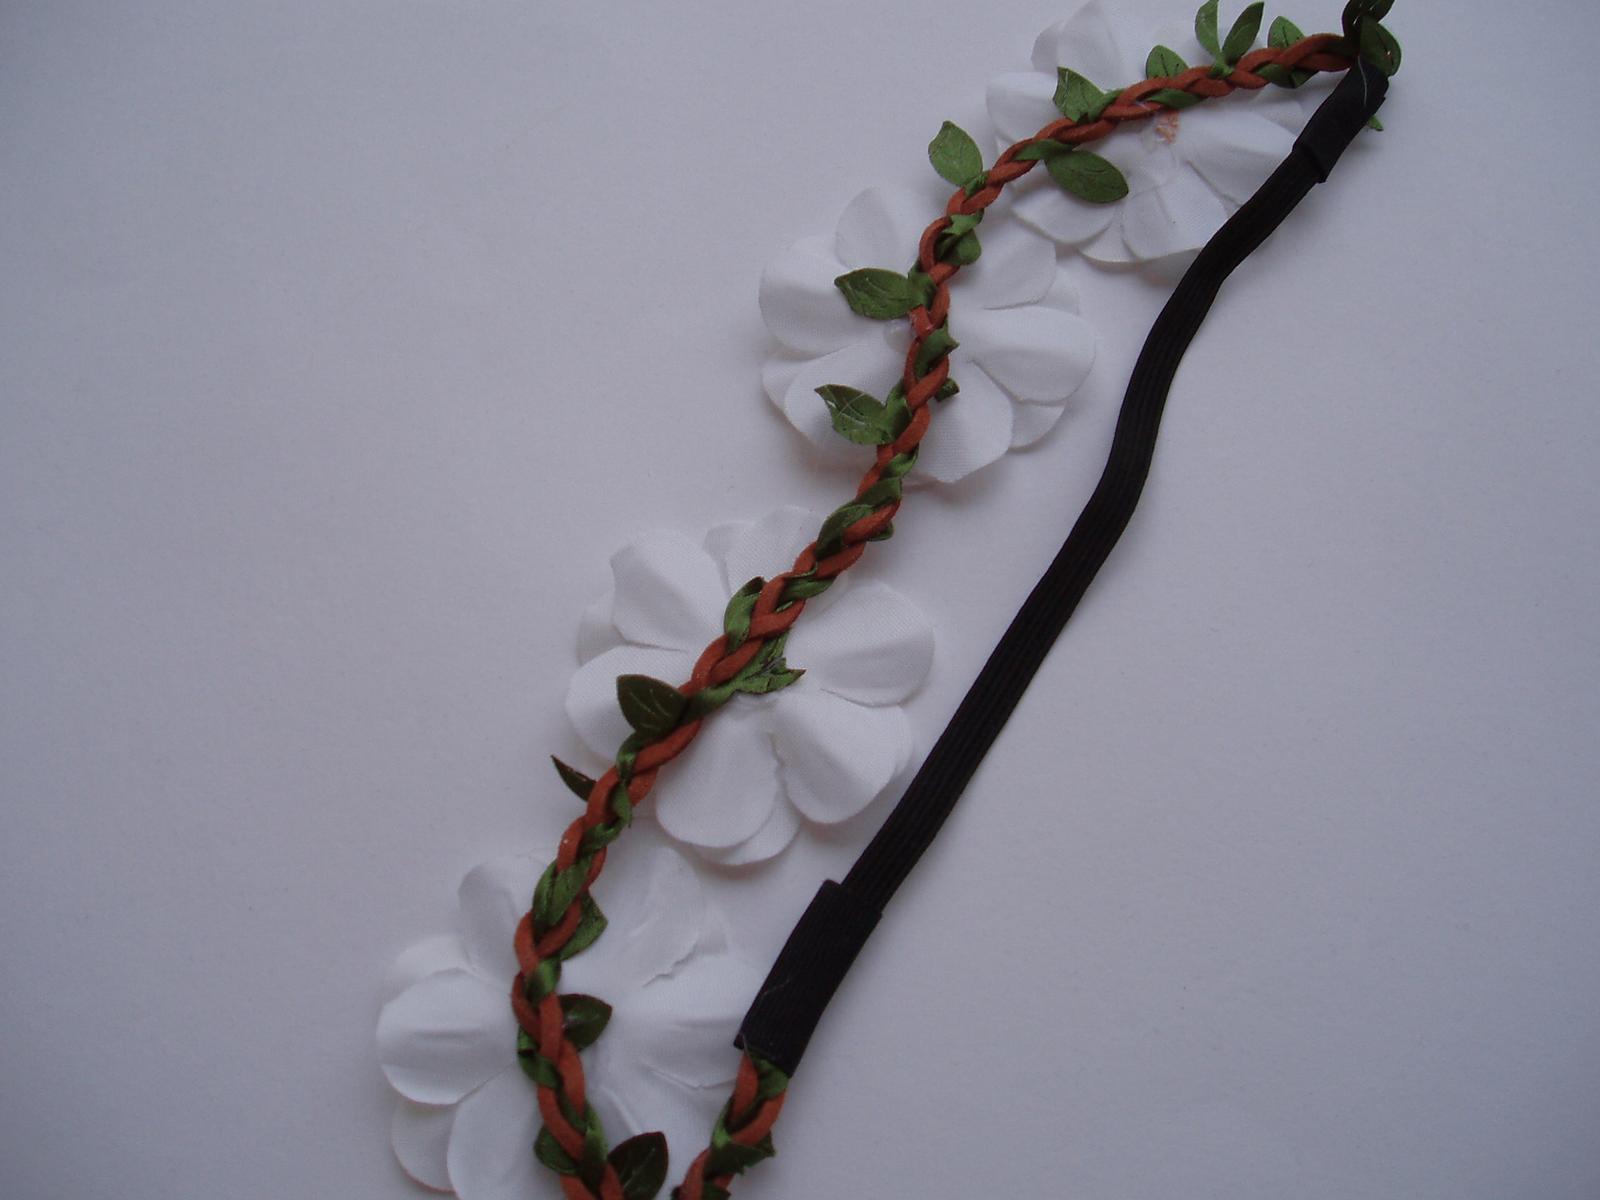 čelenka do vlasů-bílá - Obrázek č. 3